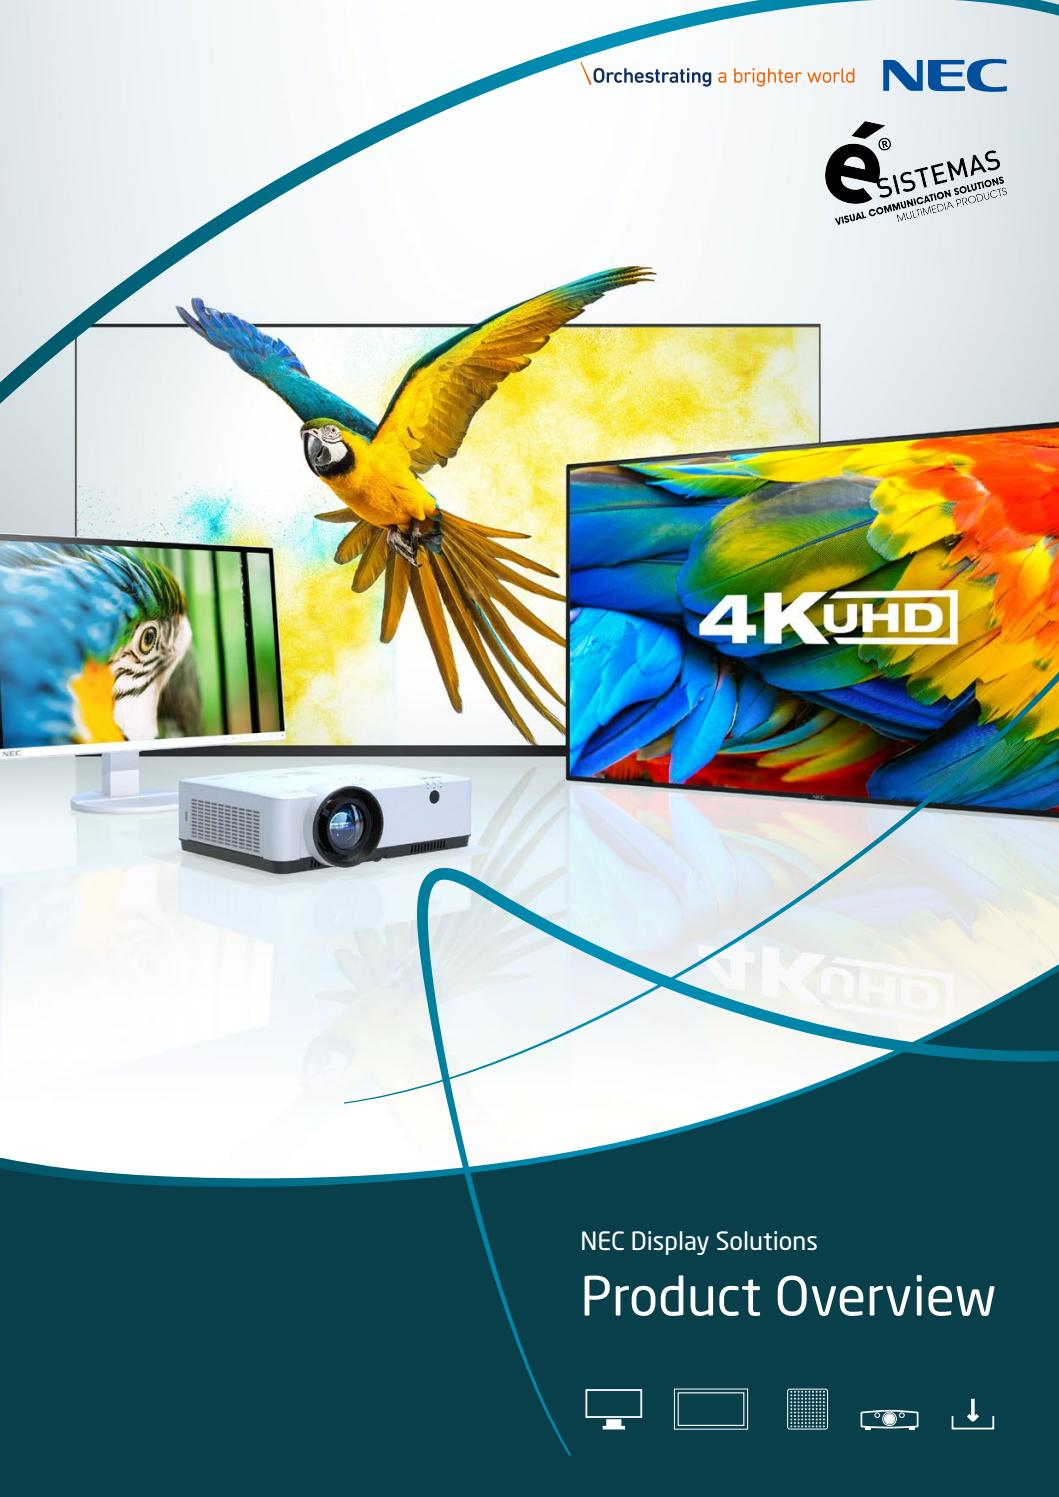 22 Nec Display Solutions by Ésistemas Portugal   issuu